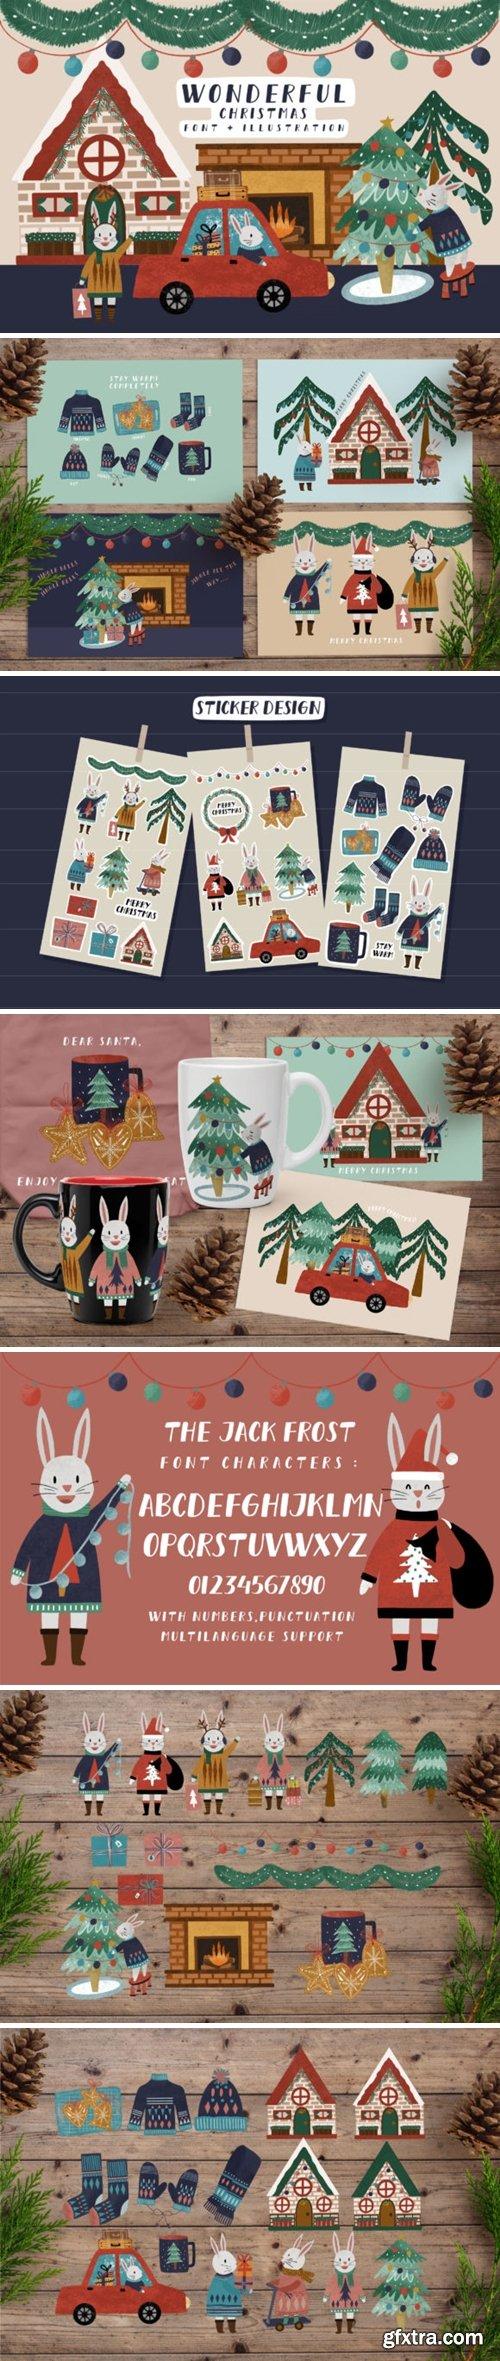 Wonderful Christmas 2061697